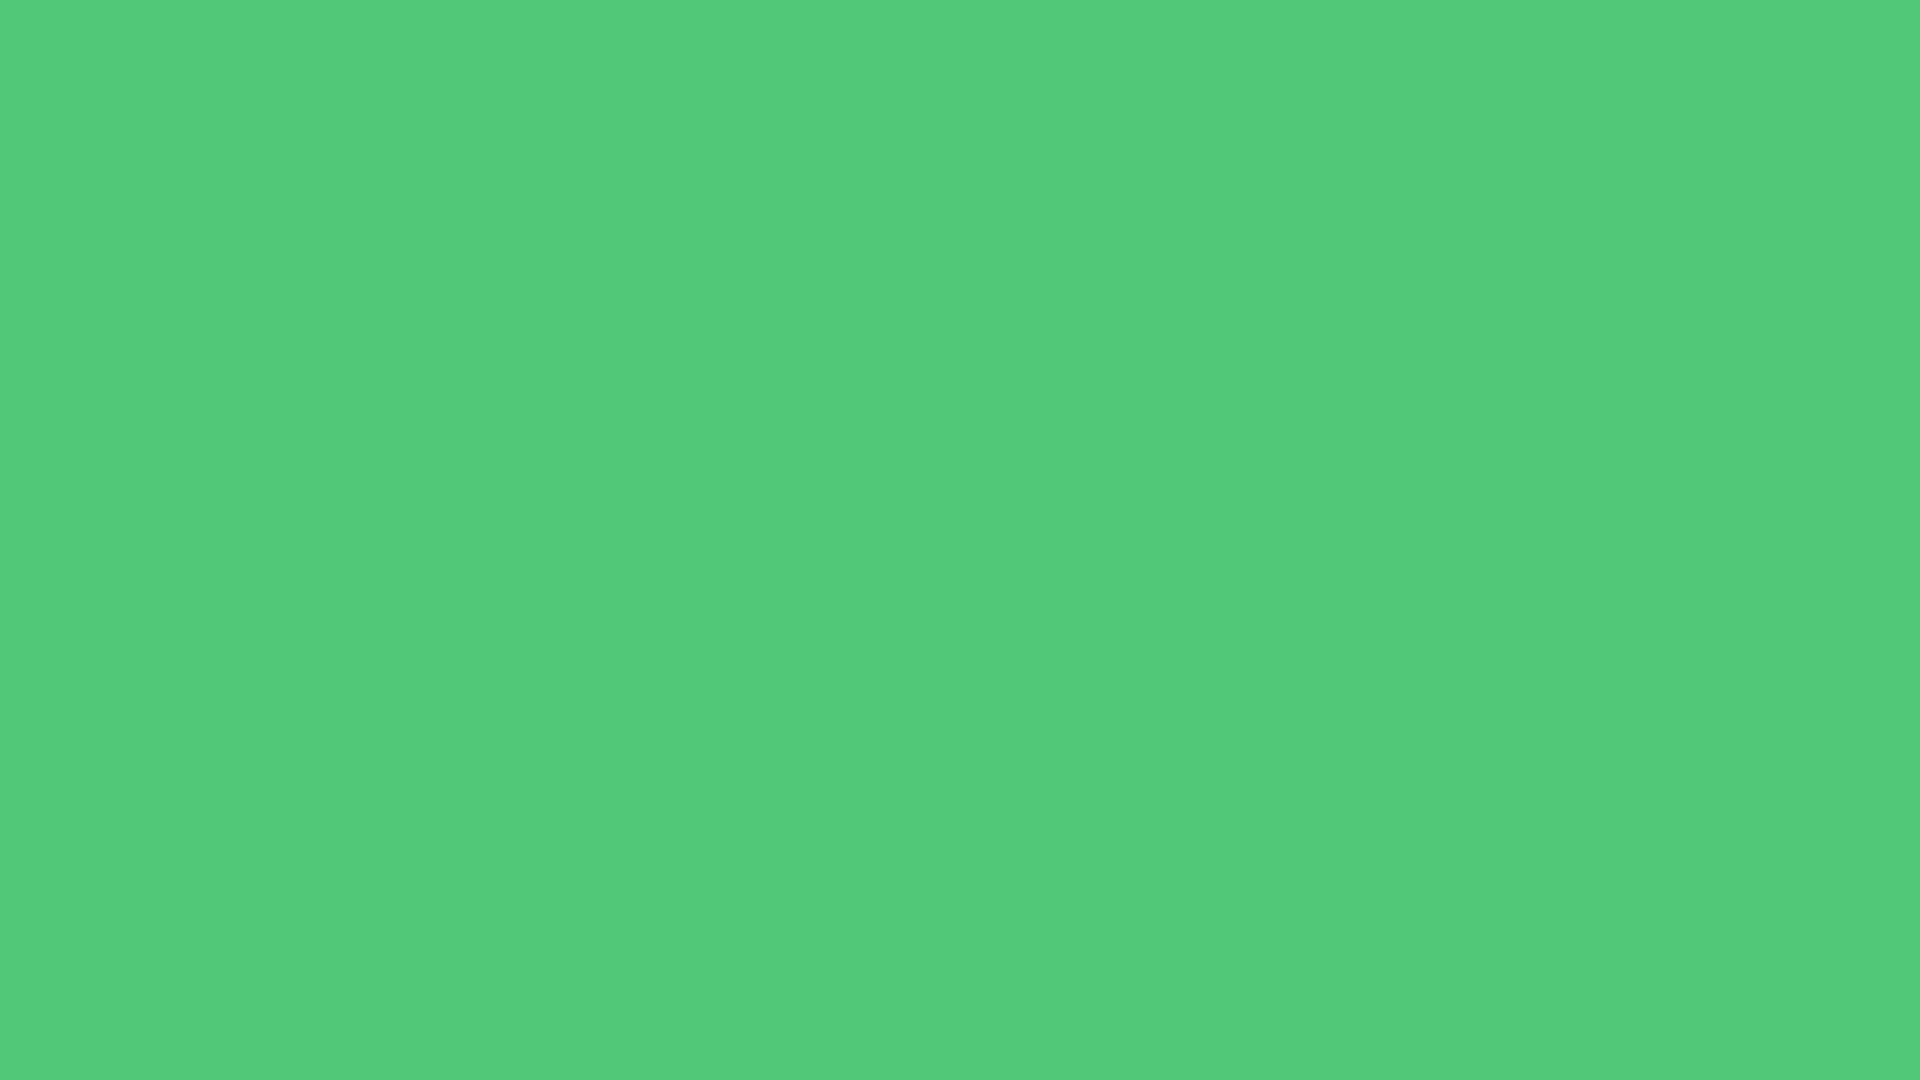 1920×1080-paris-green-solid-color-background.jpg